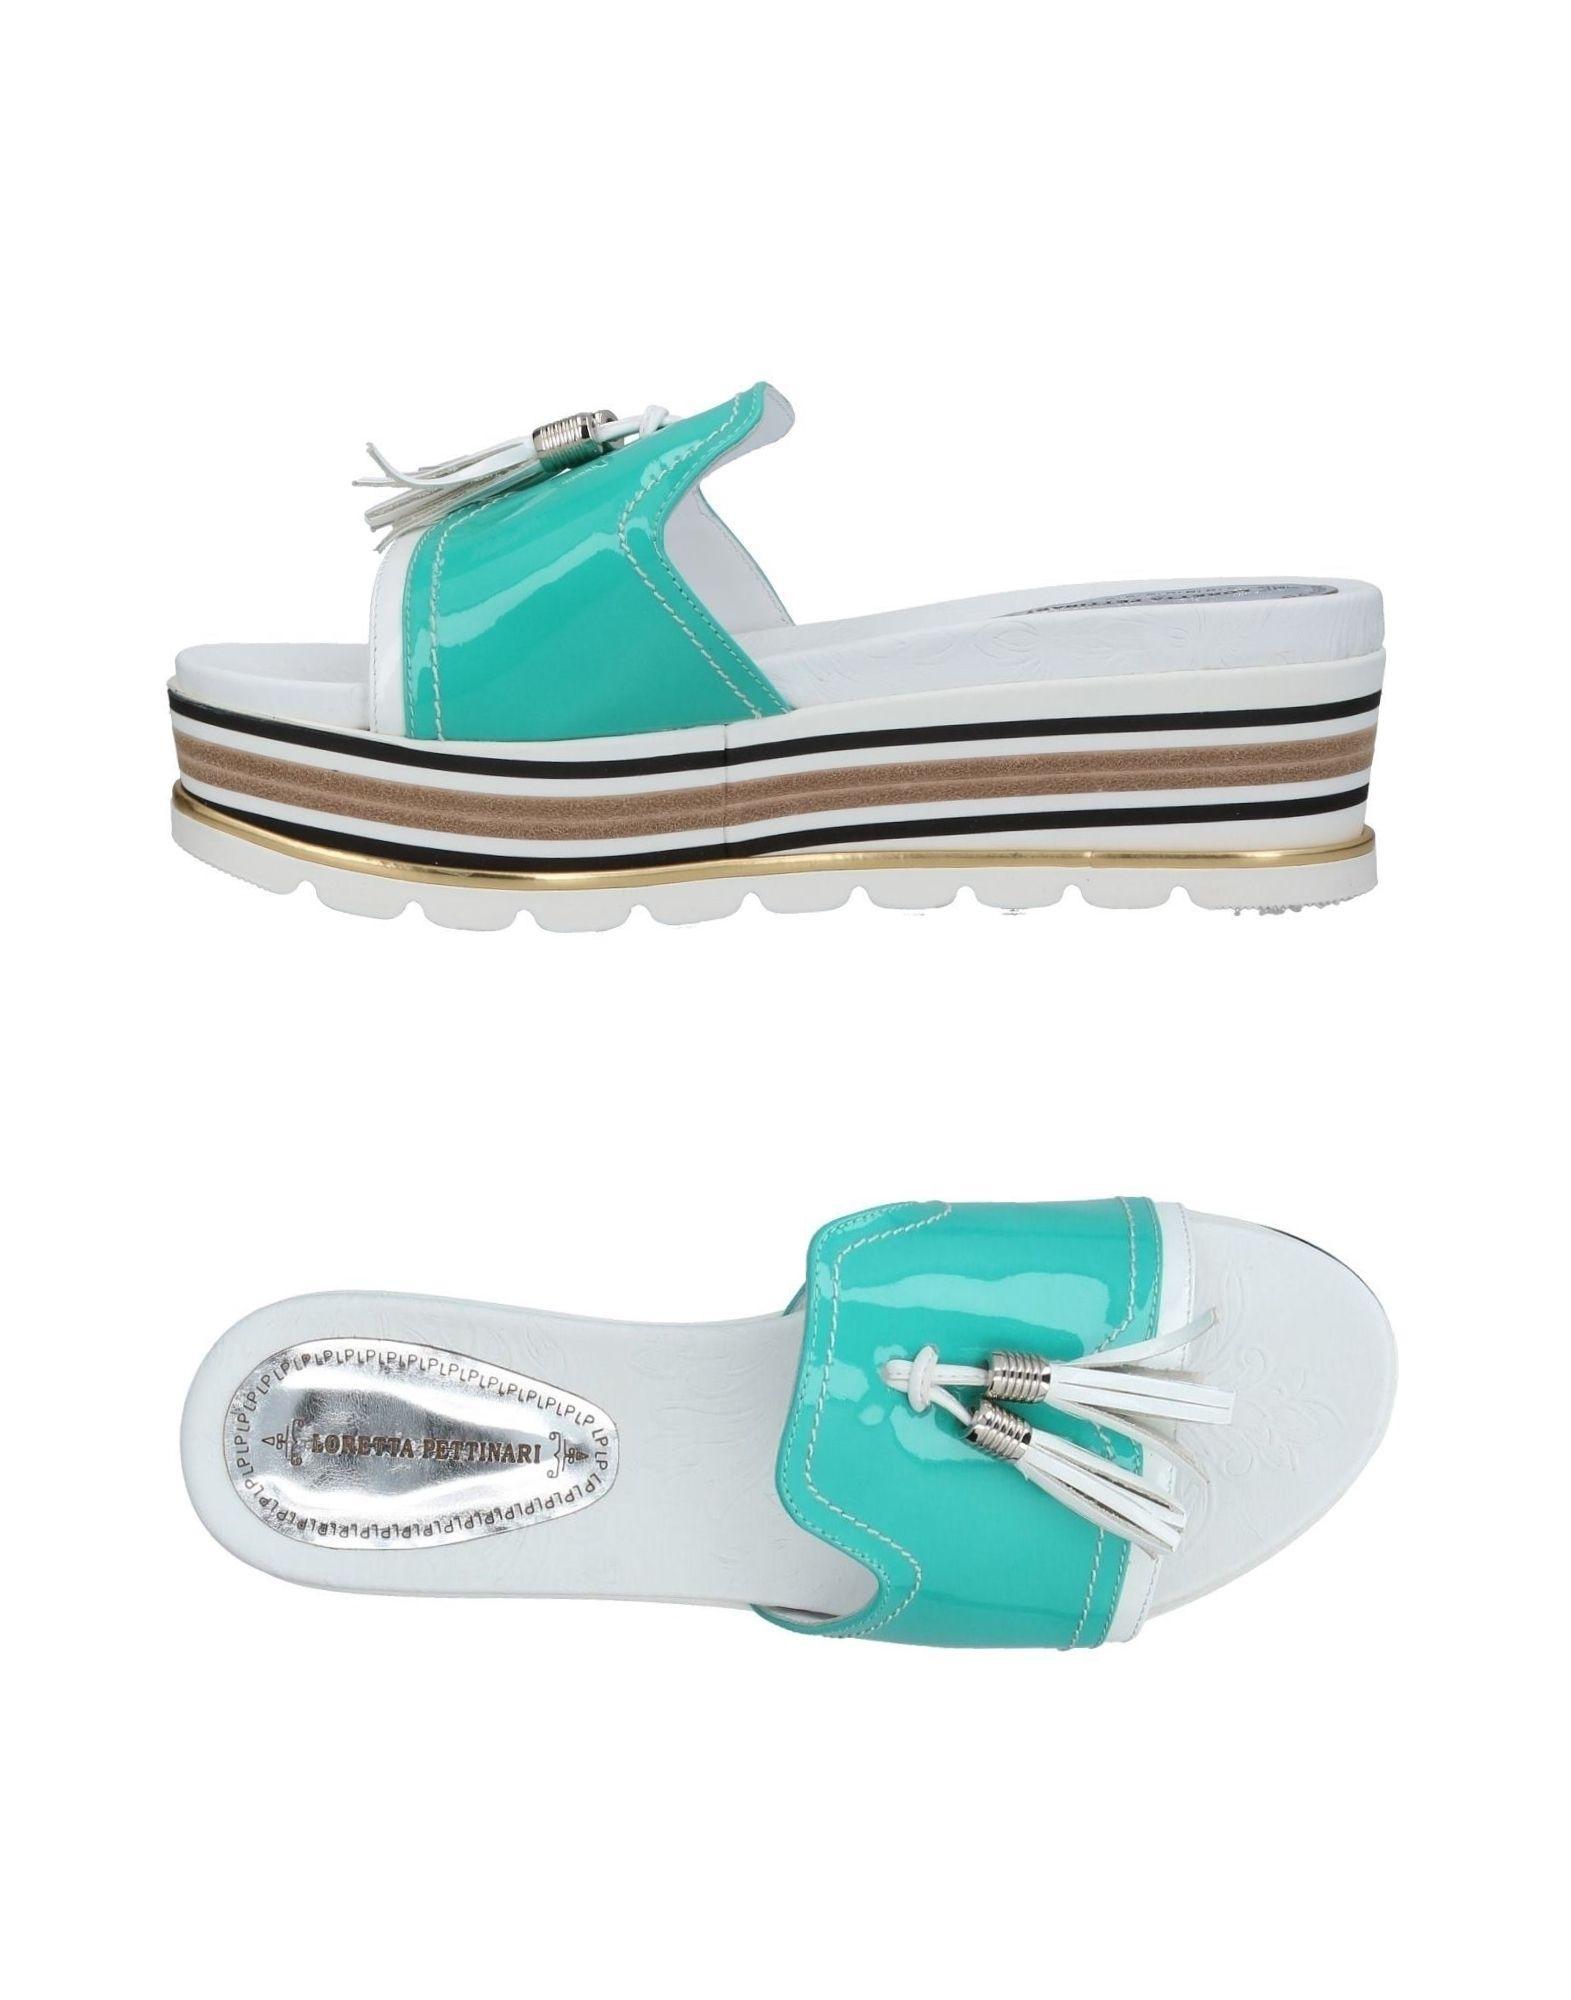 Loretta Pettinari Sandalen Damen  11389896JF Gute Qualität beliebte Schuhe